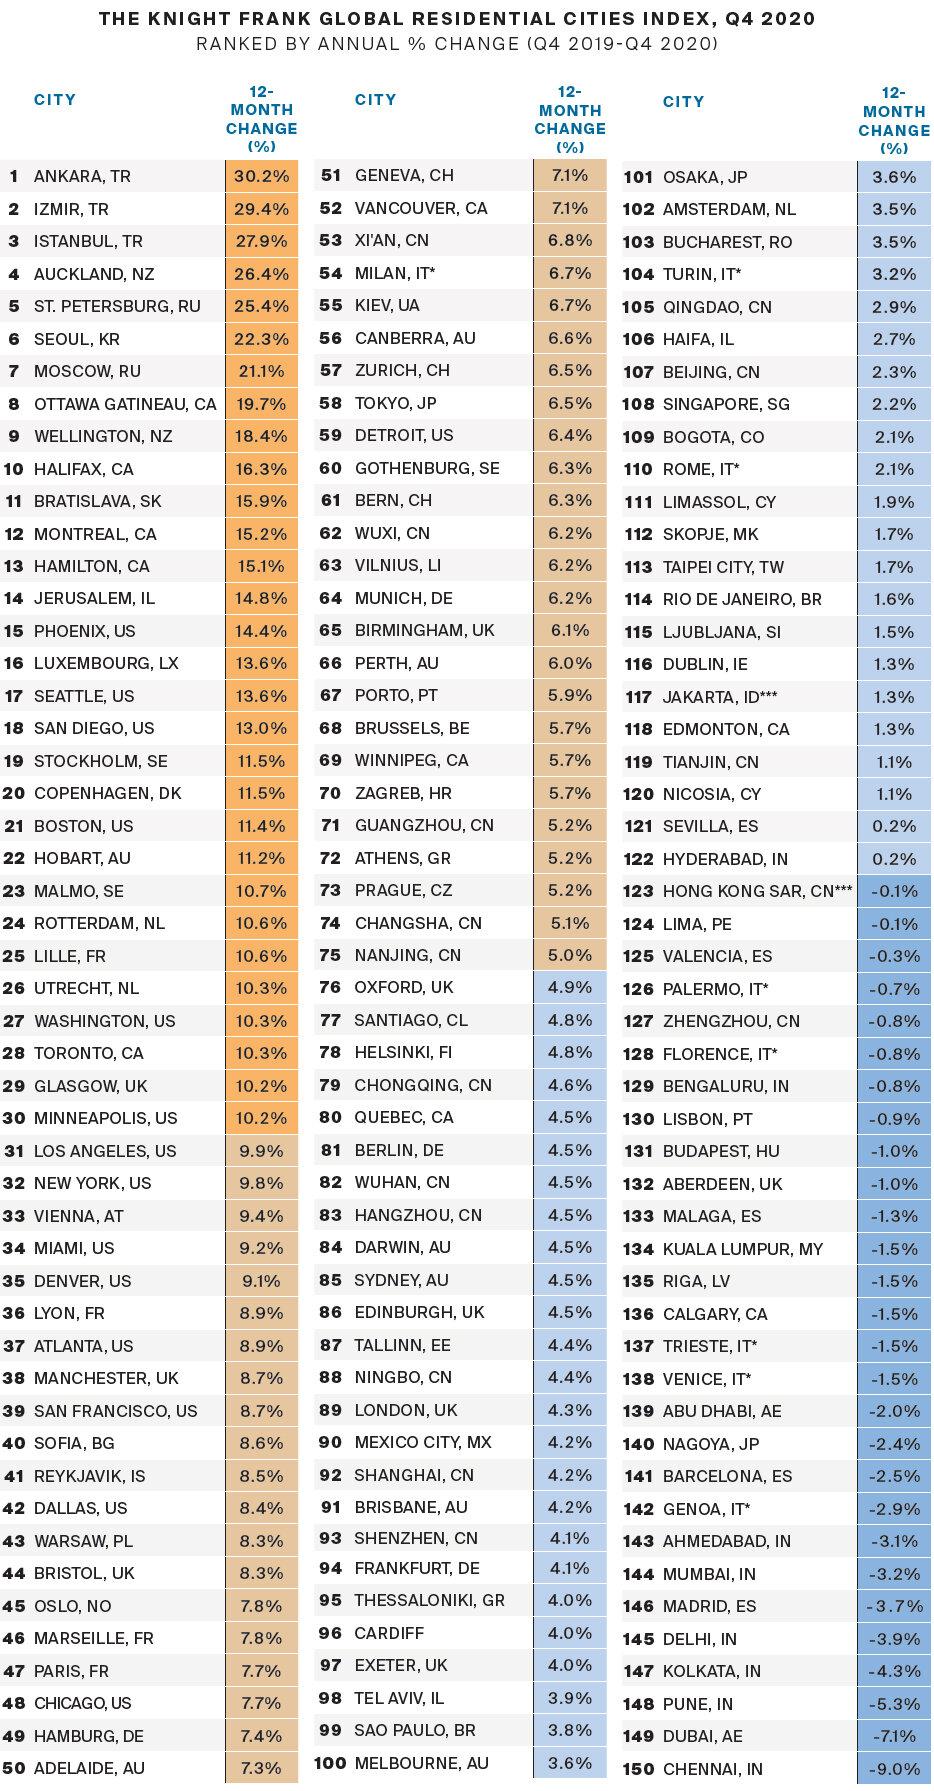 https://www.worldpropertyjournal.com/news-assets/Knight-Frank-Global-Residential-Cities-Index%2C-Q4-2020.jpg